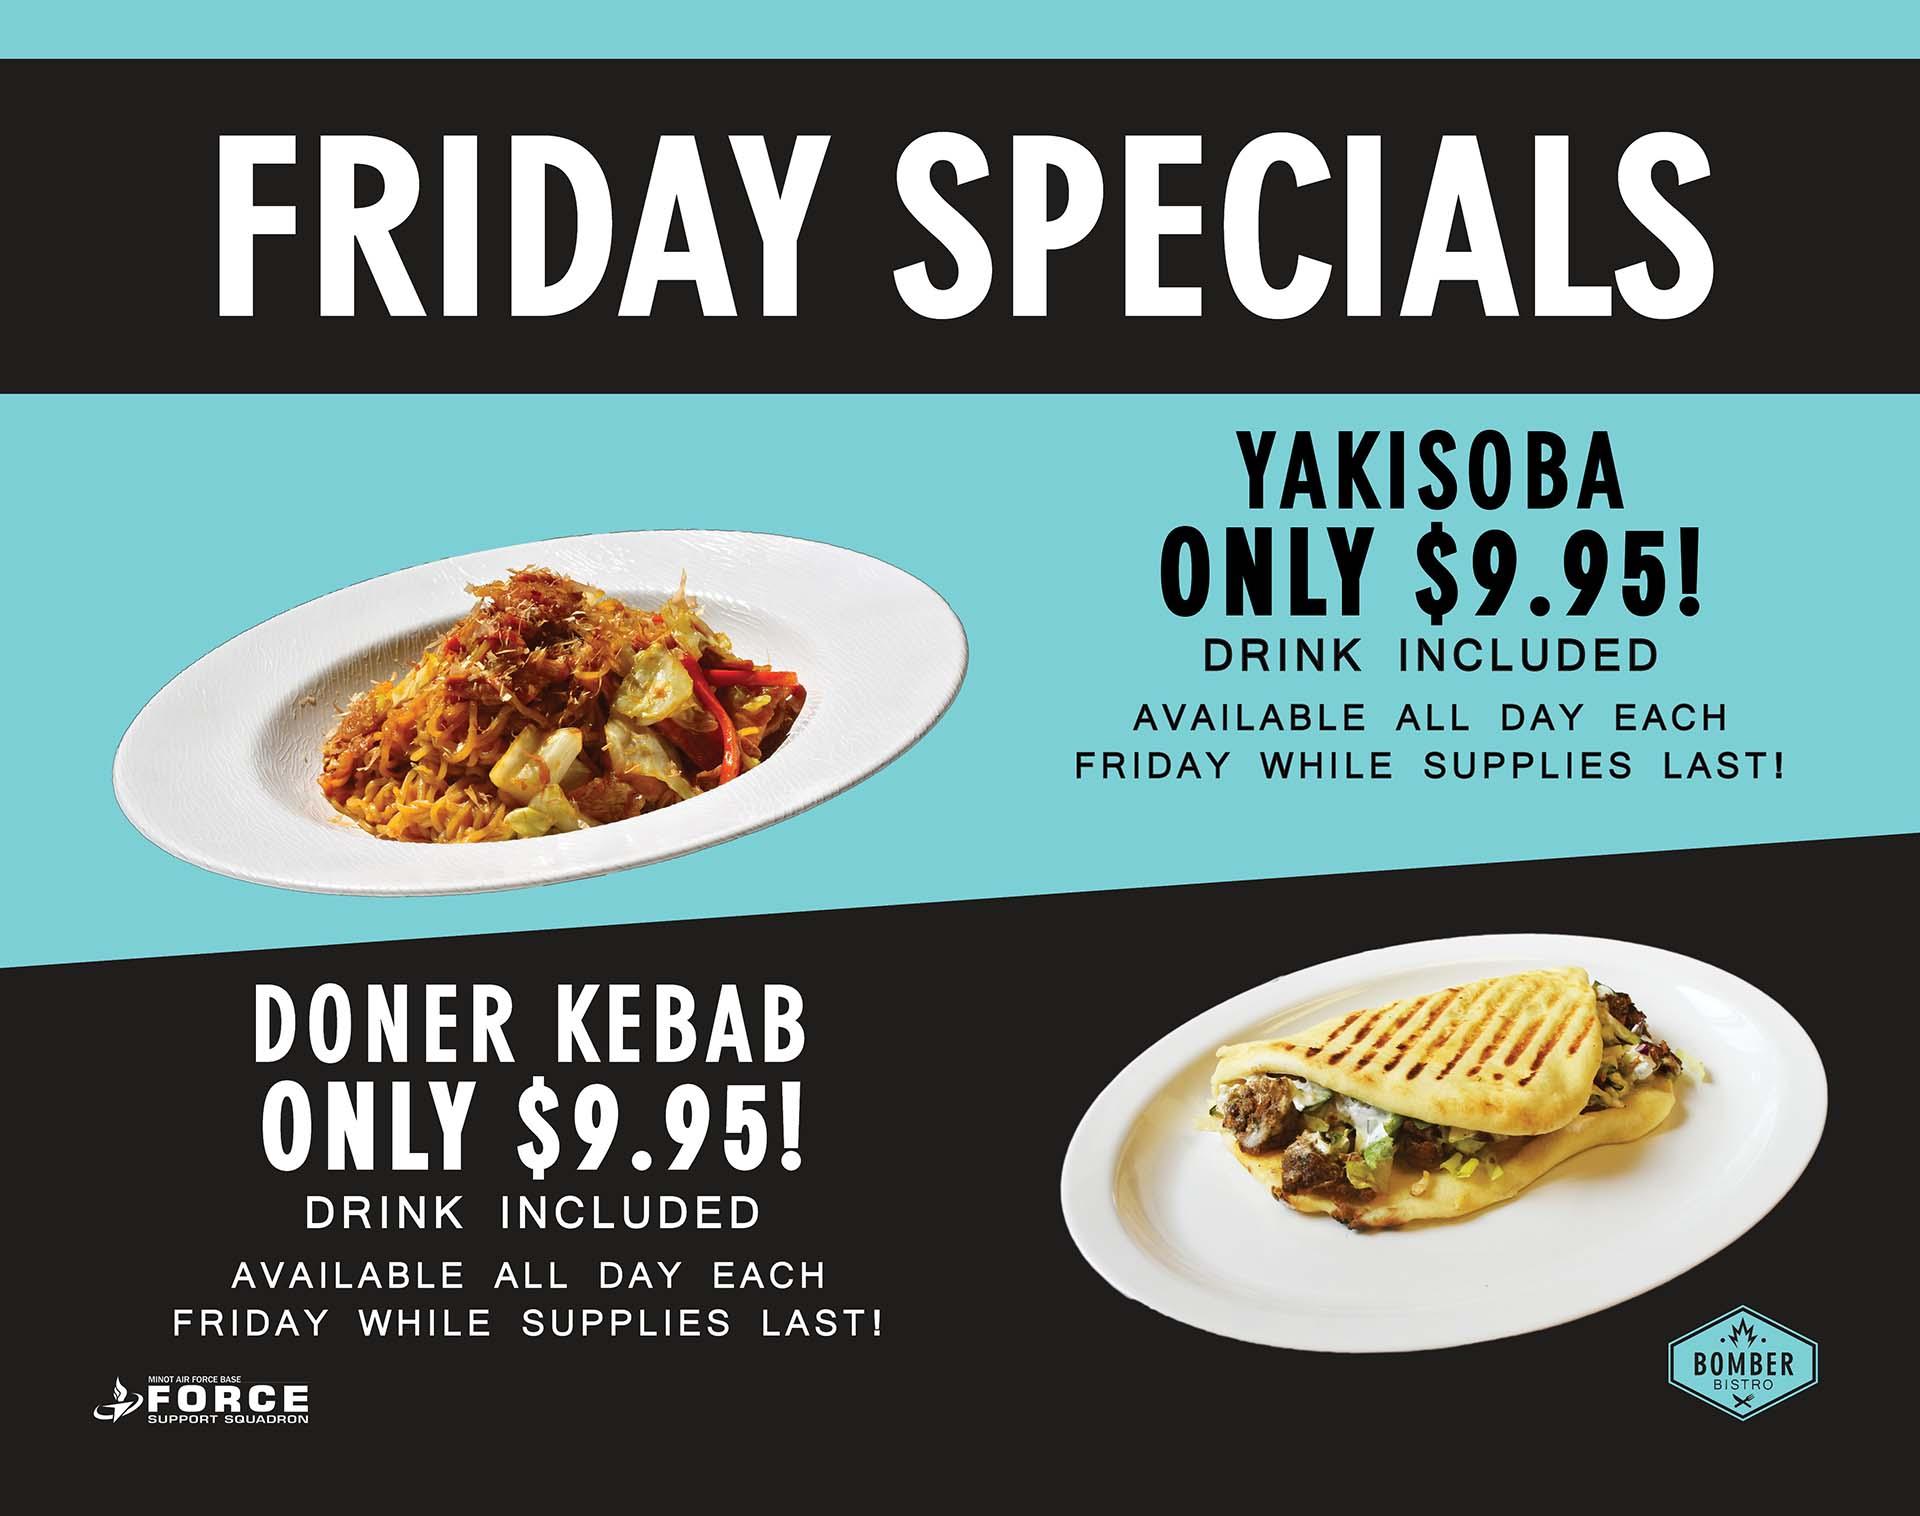 Bomber Bistro - Fridays Specials - July 21